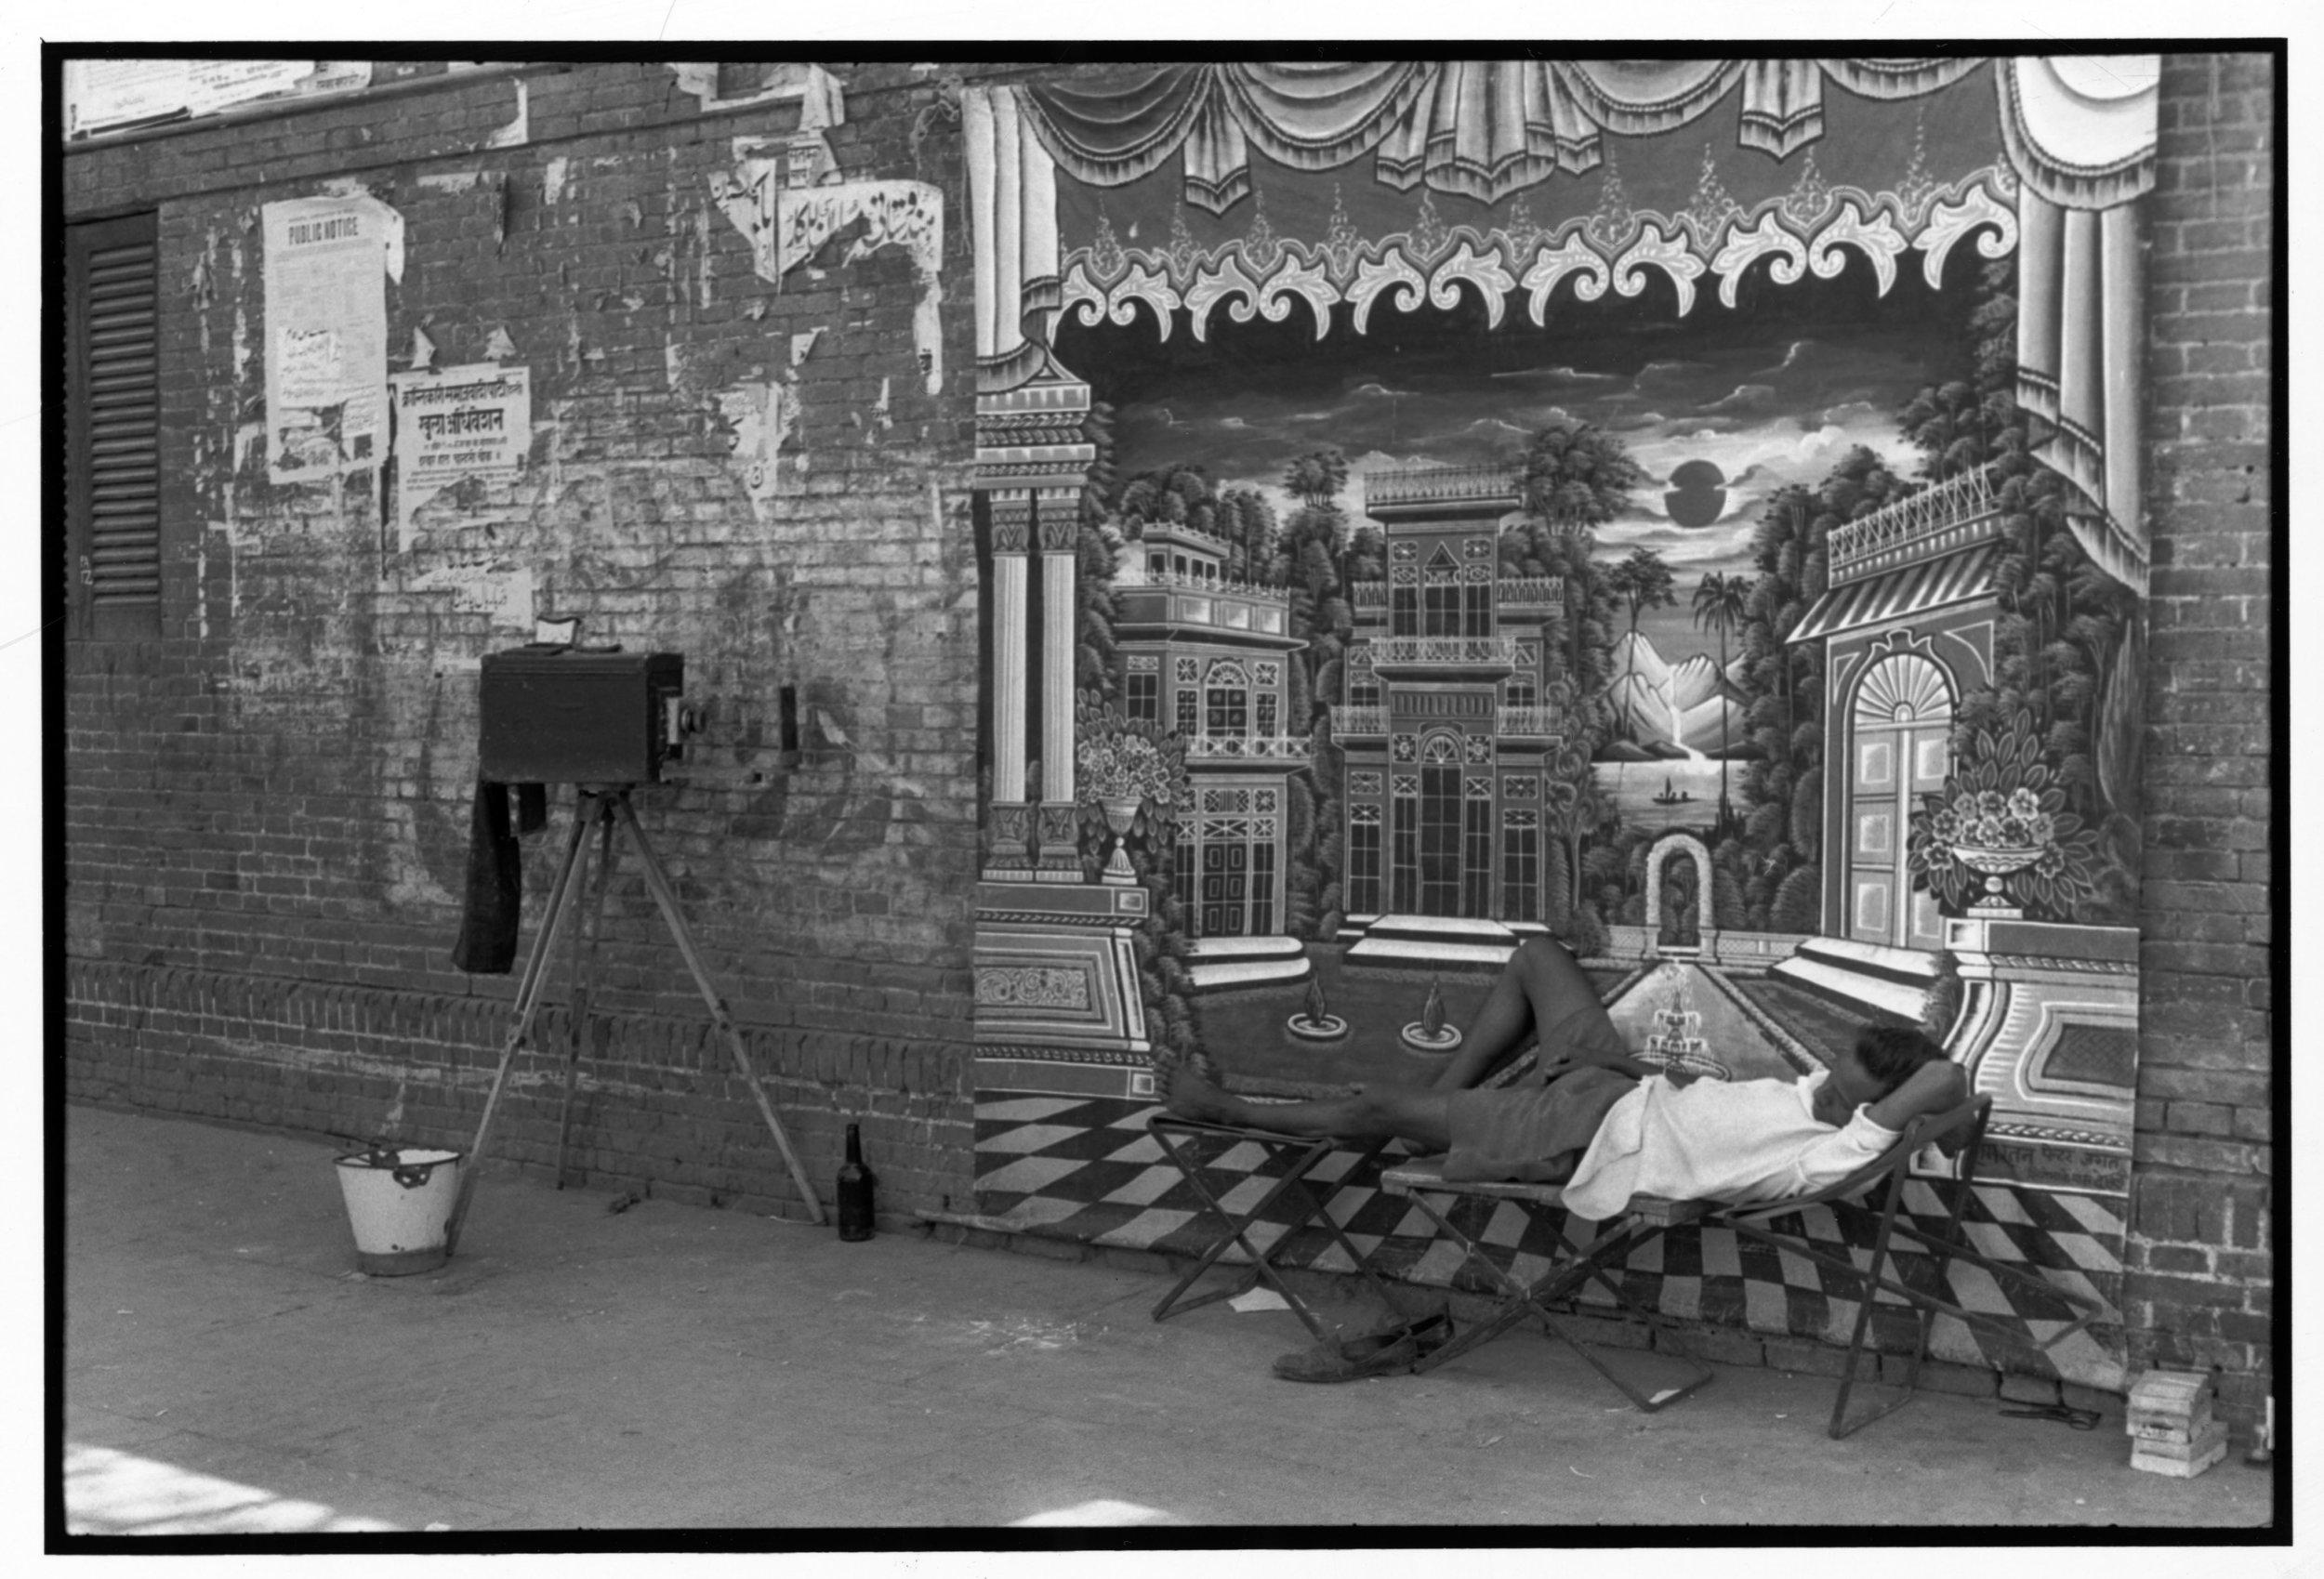 Street photographer in the old city Delhi, India; 1966 35 x 52.5 cm.©Henri Cartier-Bresson/Magnum Photos